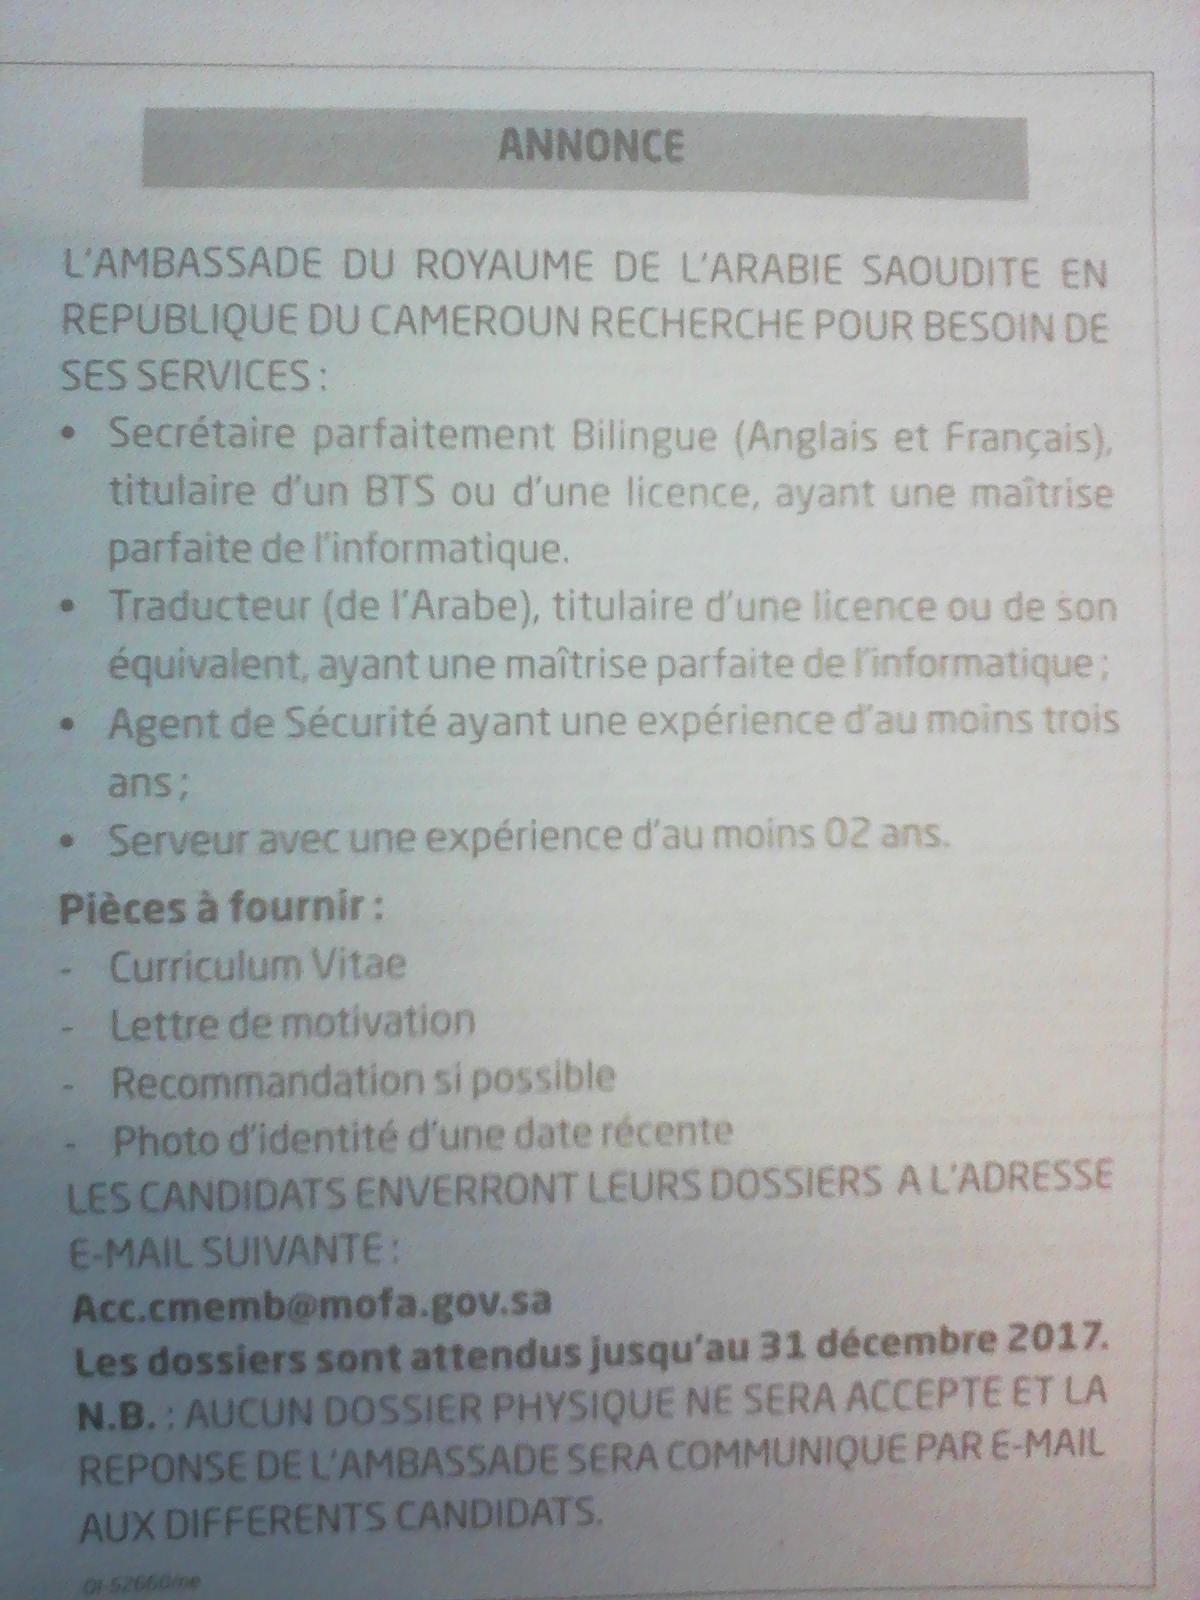 avis de recrutement   ambassade du royaume de l u2019arabie